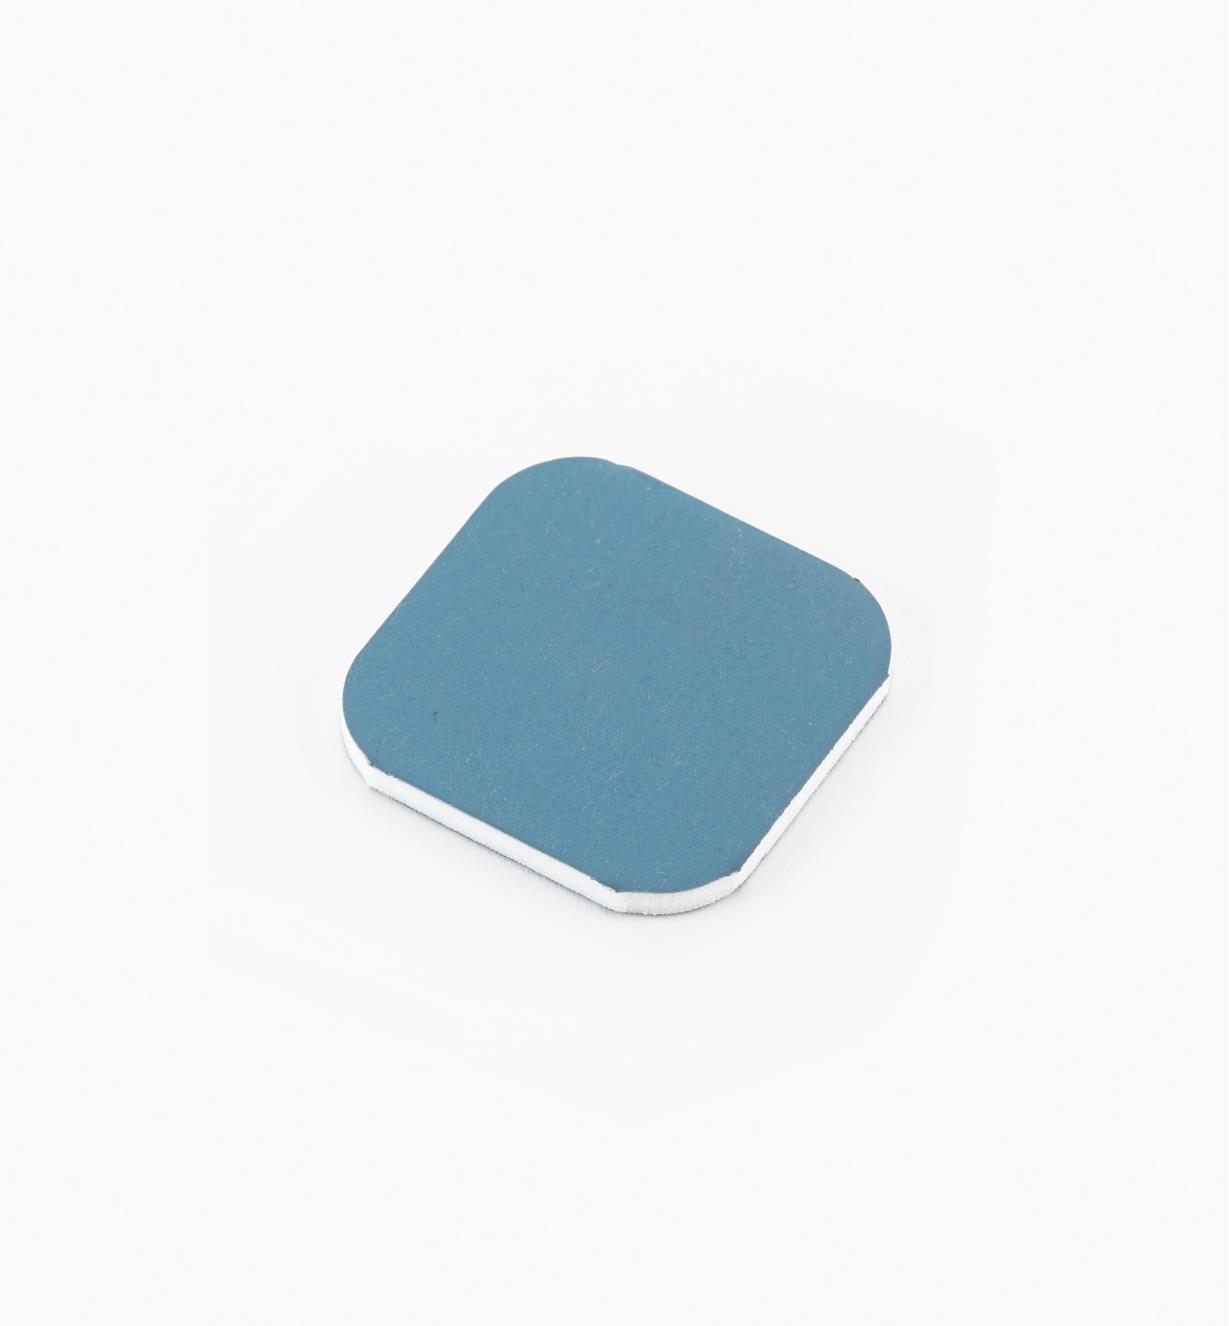 54K9017 - 8000x Micro-Mesh Pen-Sanding Pad, each